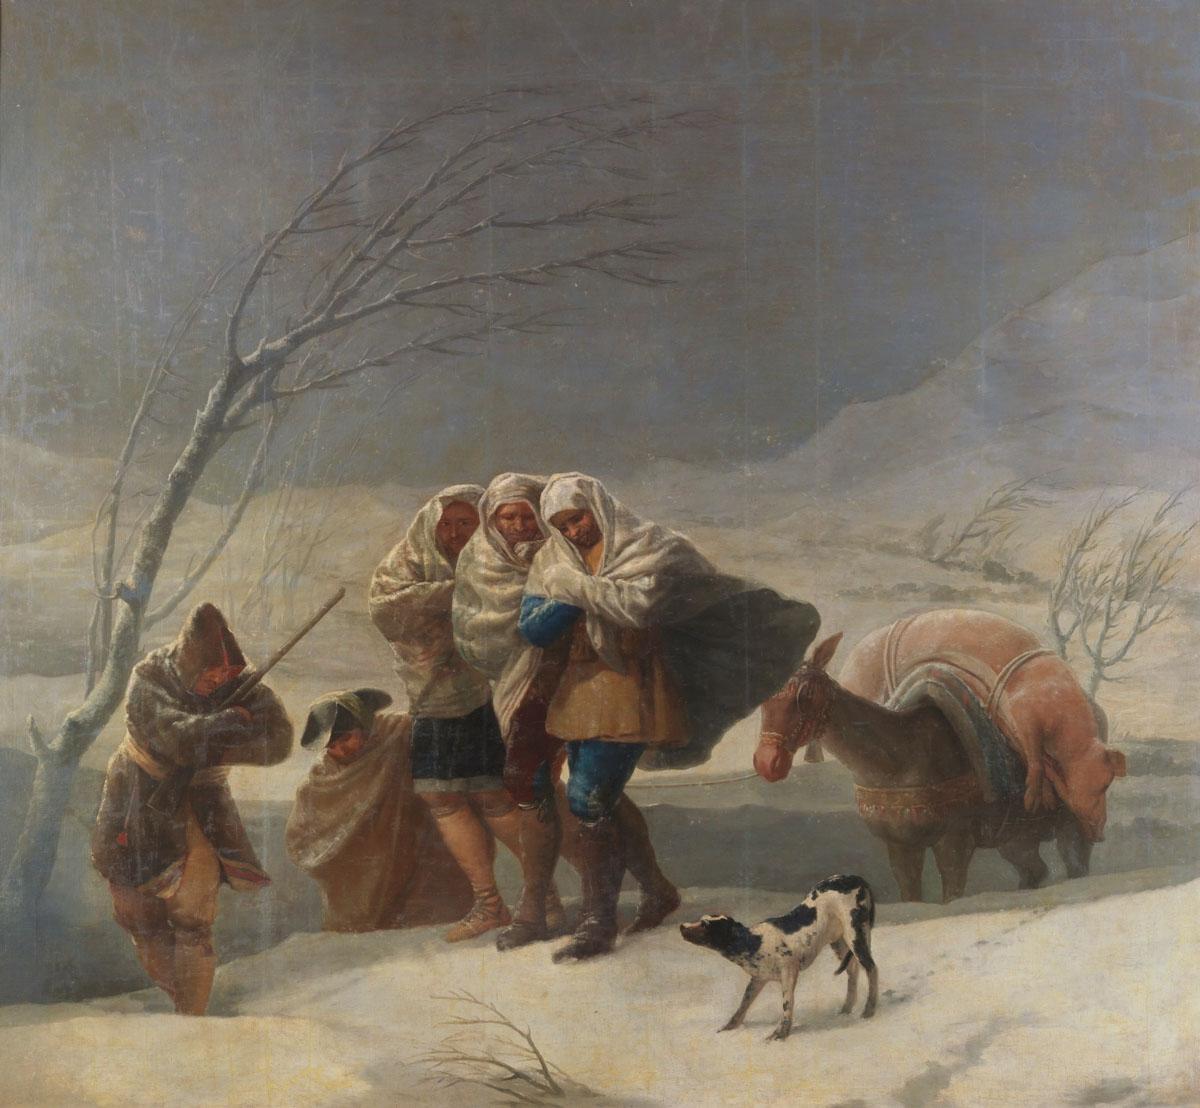 Figure 4. Goya, A nevada.